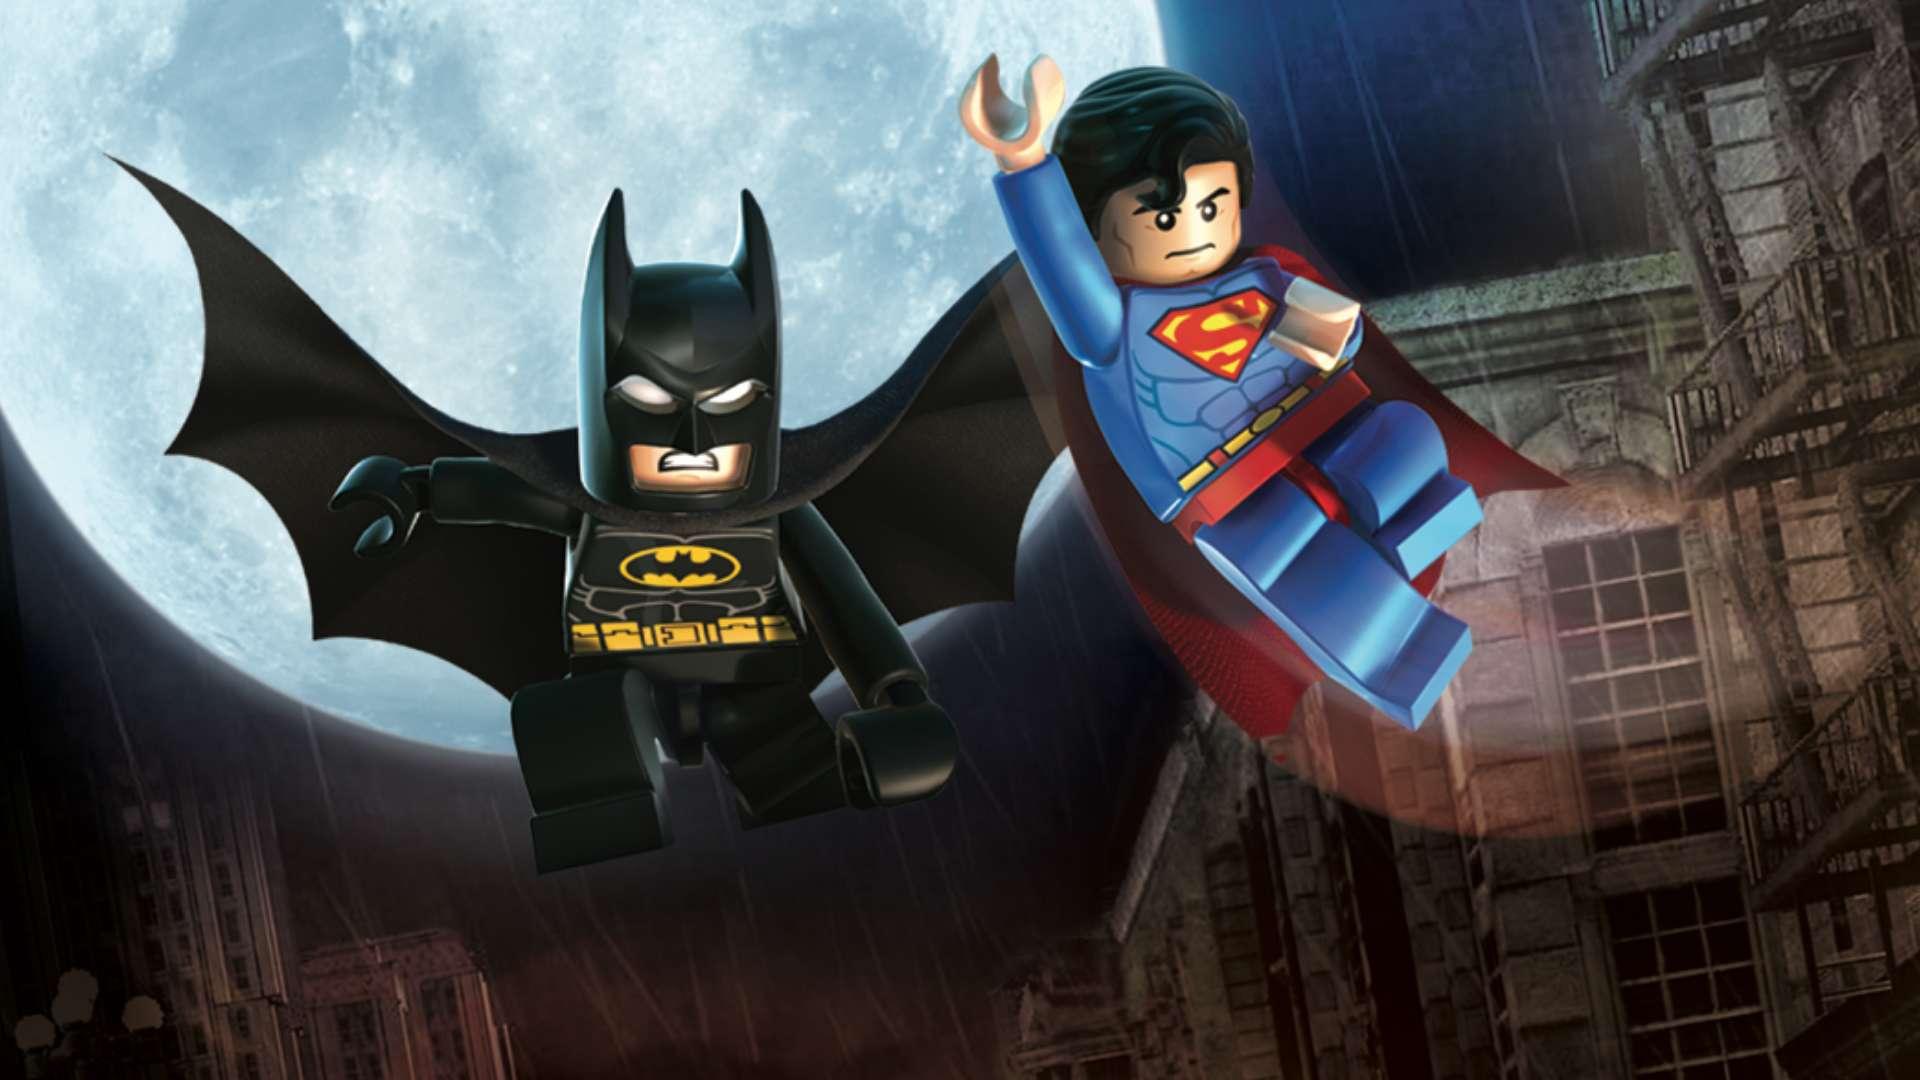 LEGO(R) バットマン:ザ・ムービー<ヒーロー大集合>